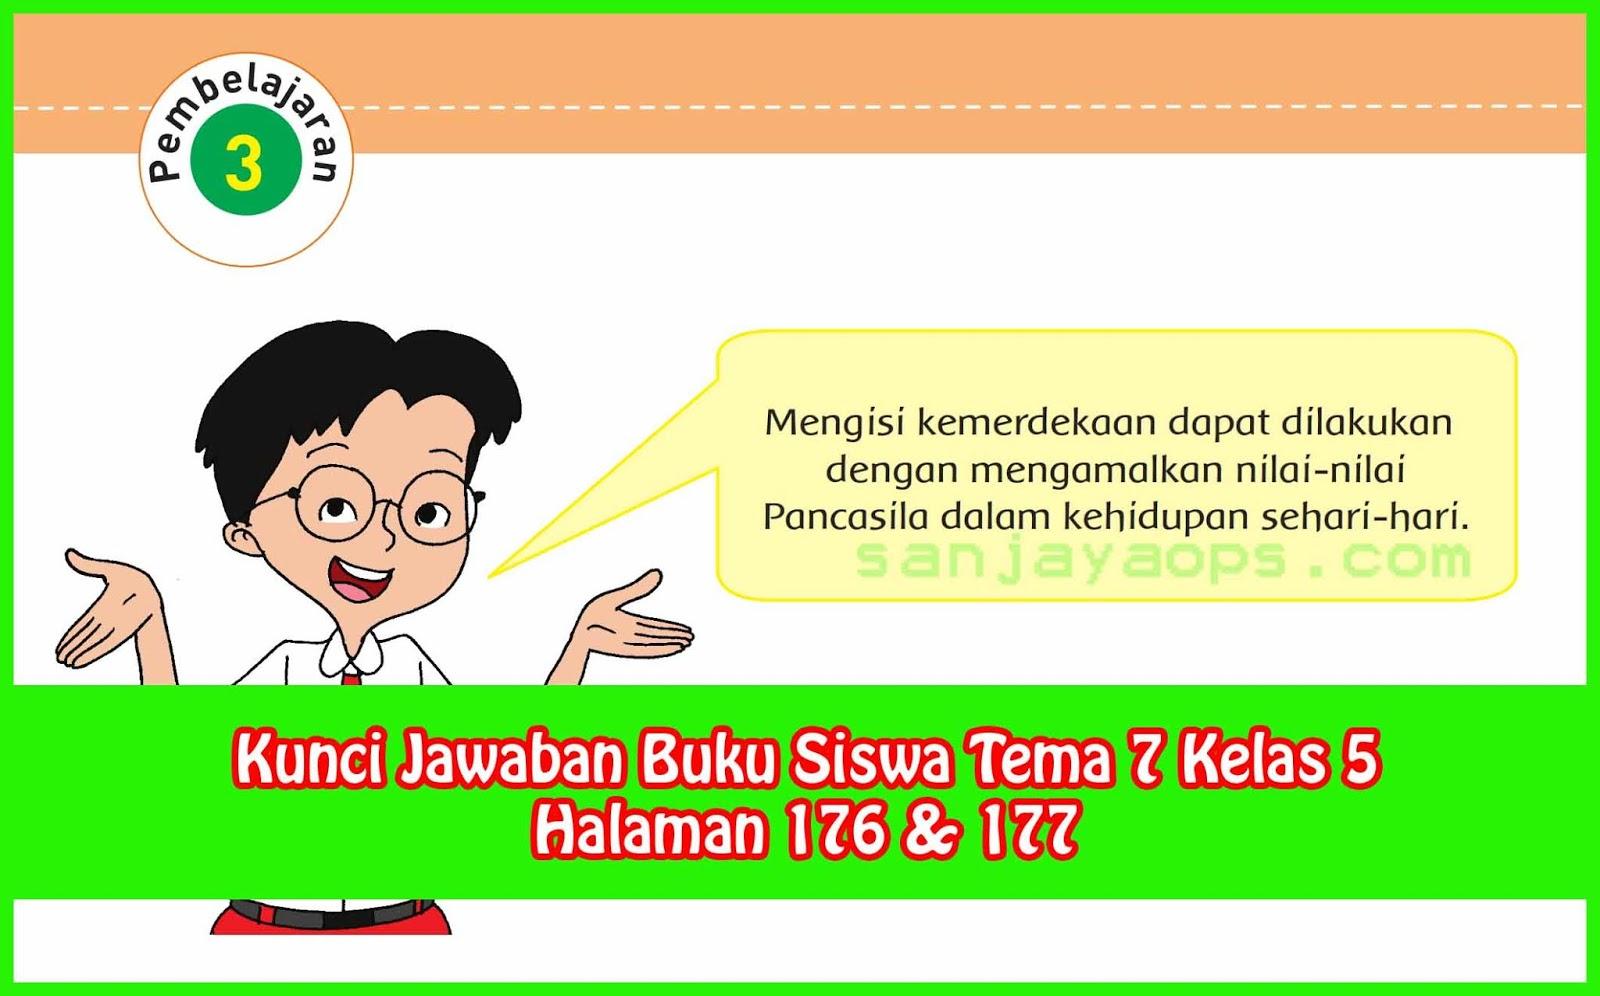 Jawaban Buku Bahasa Indonesia Kelas 11 Kurikulum 2013 Hal 107